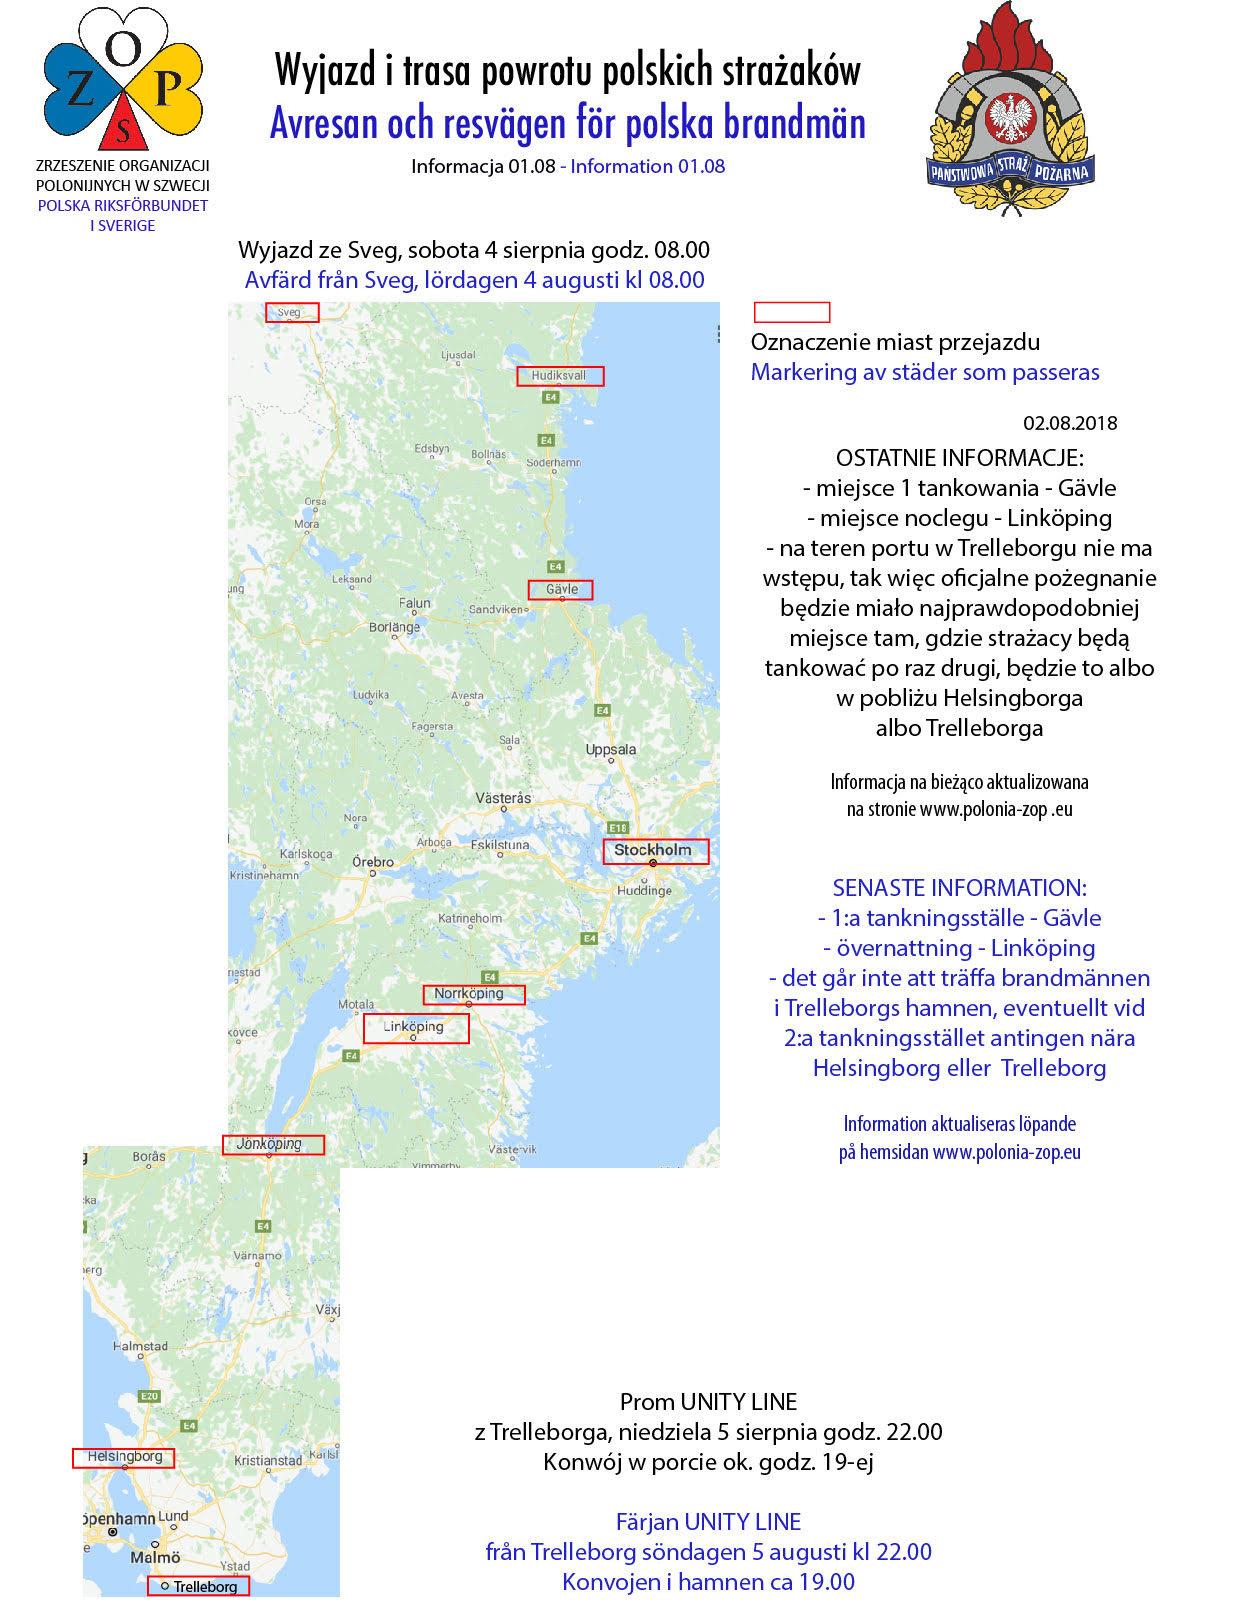 Karta avresan polska brandmän 2